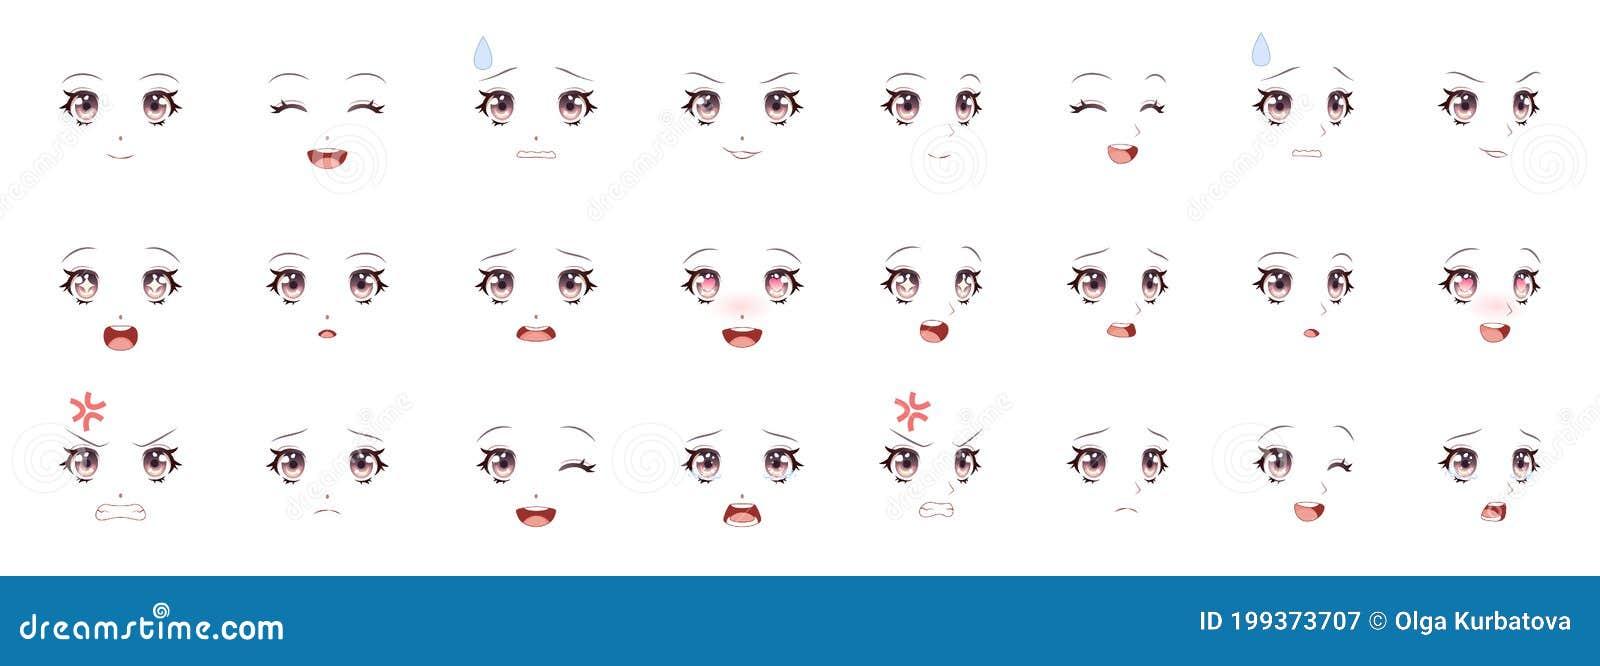 Manga Expression. Girl Eyes, Mouth, Eyebrows Anime Woman Faces